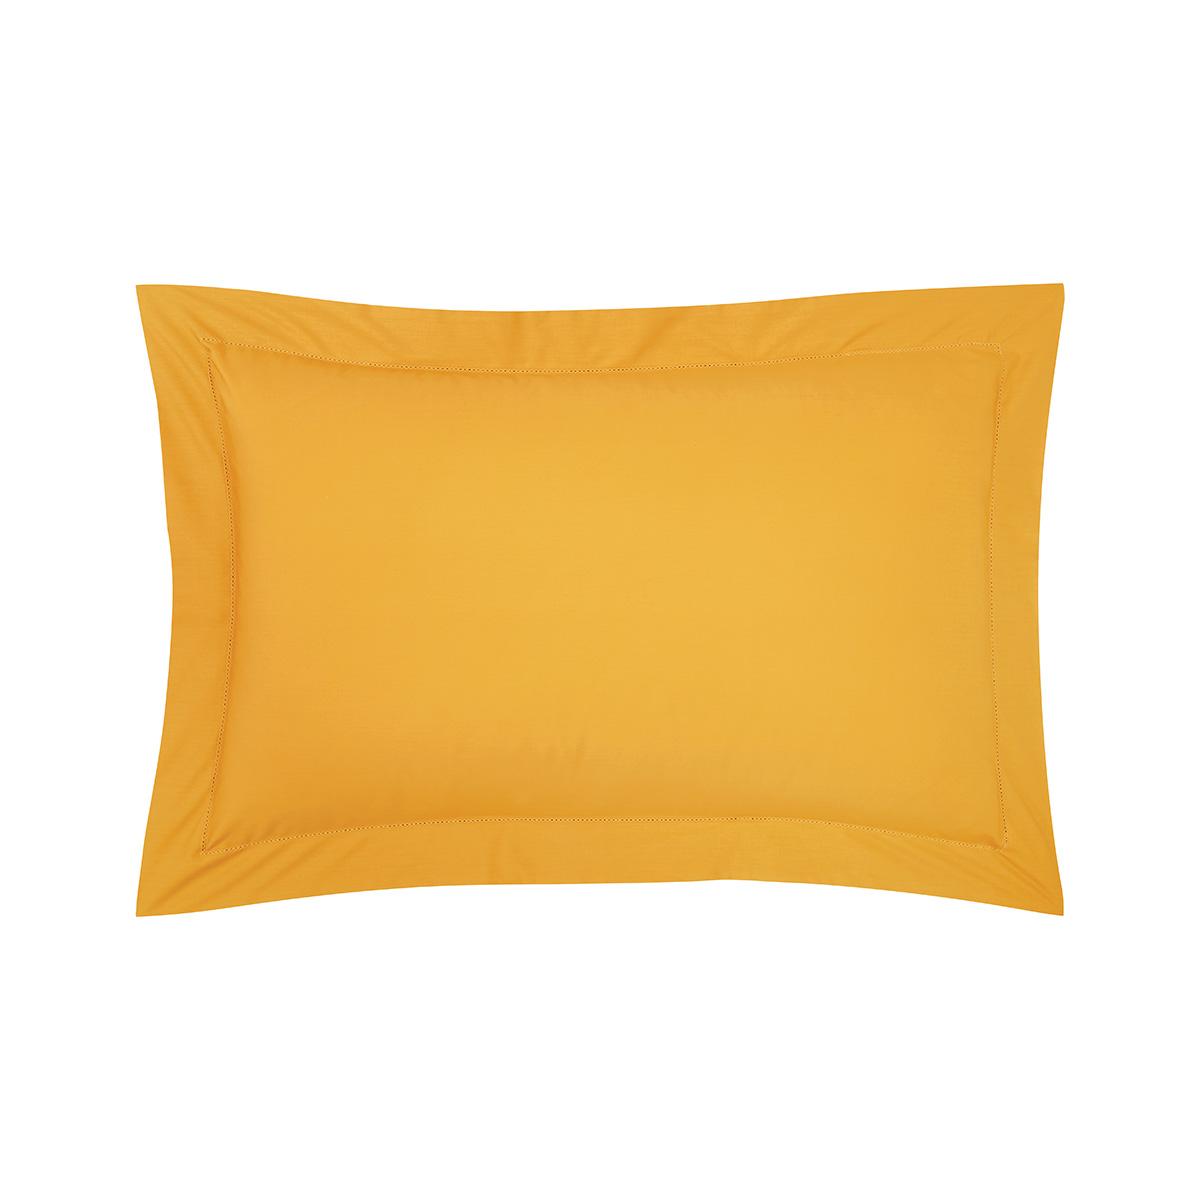 Taie d'oreiller percale Orange 50 x 75 cm